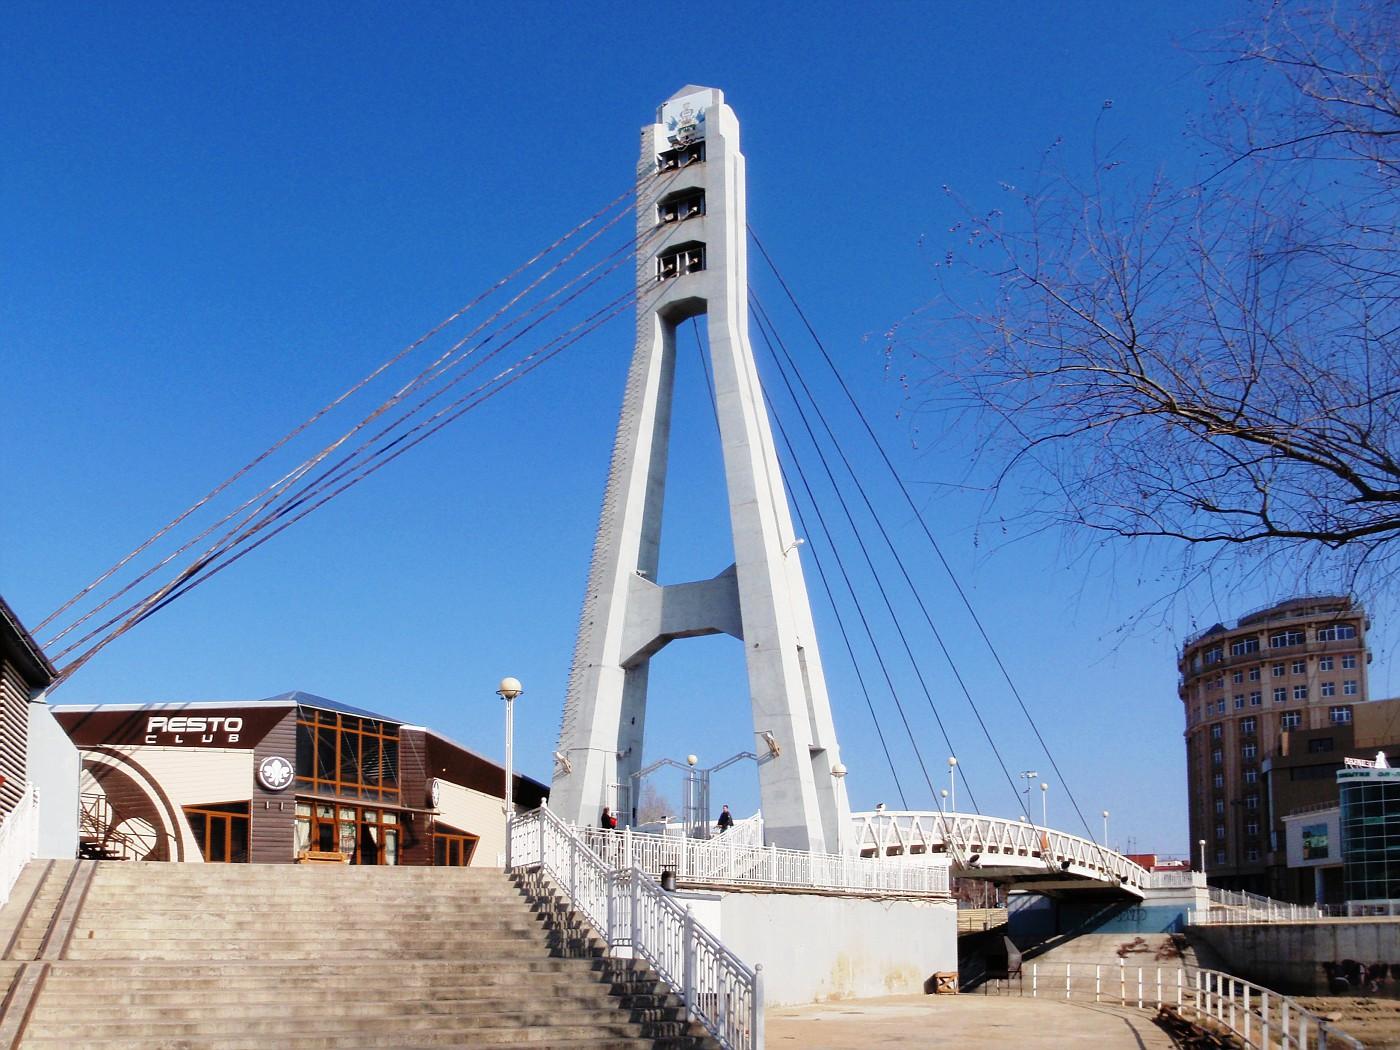 Bridge of Kisses